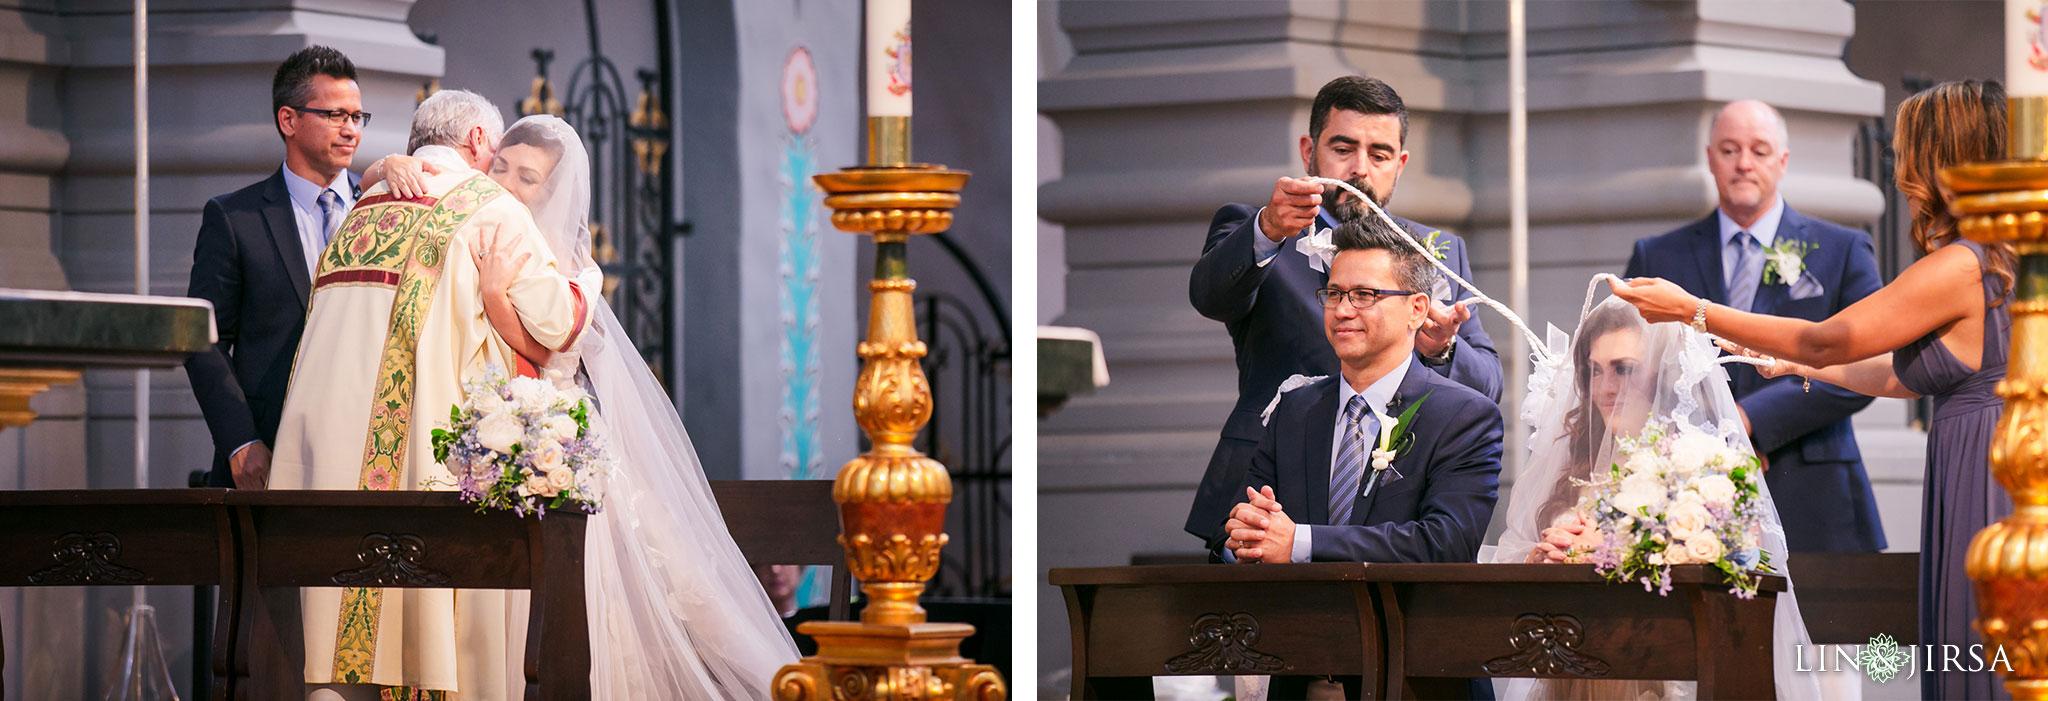 015 mission basilica san juan capistrano wedding ceremony photography